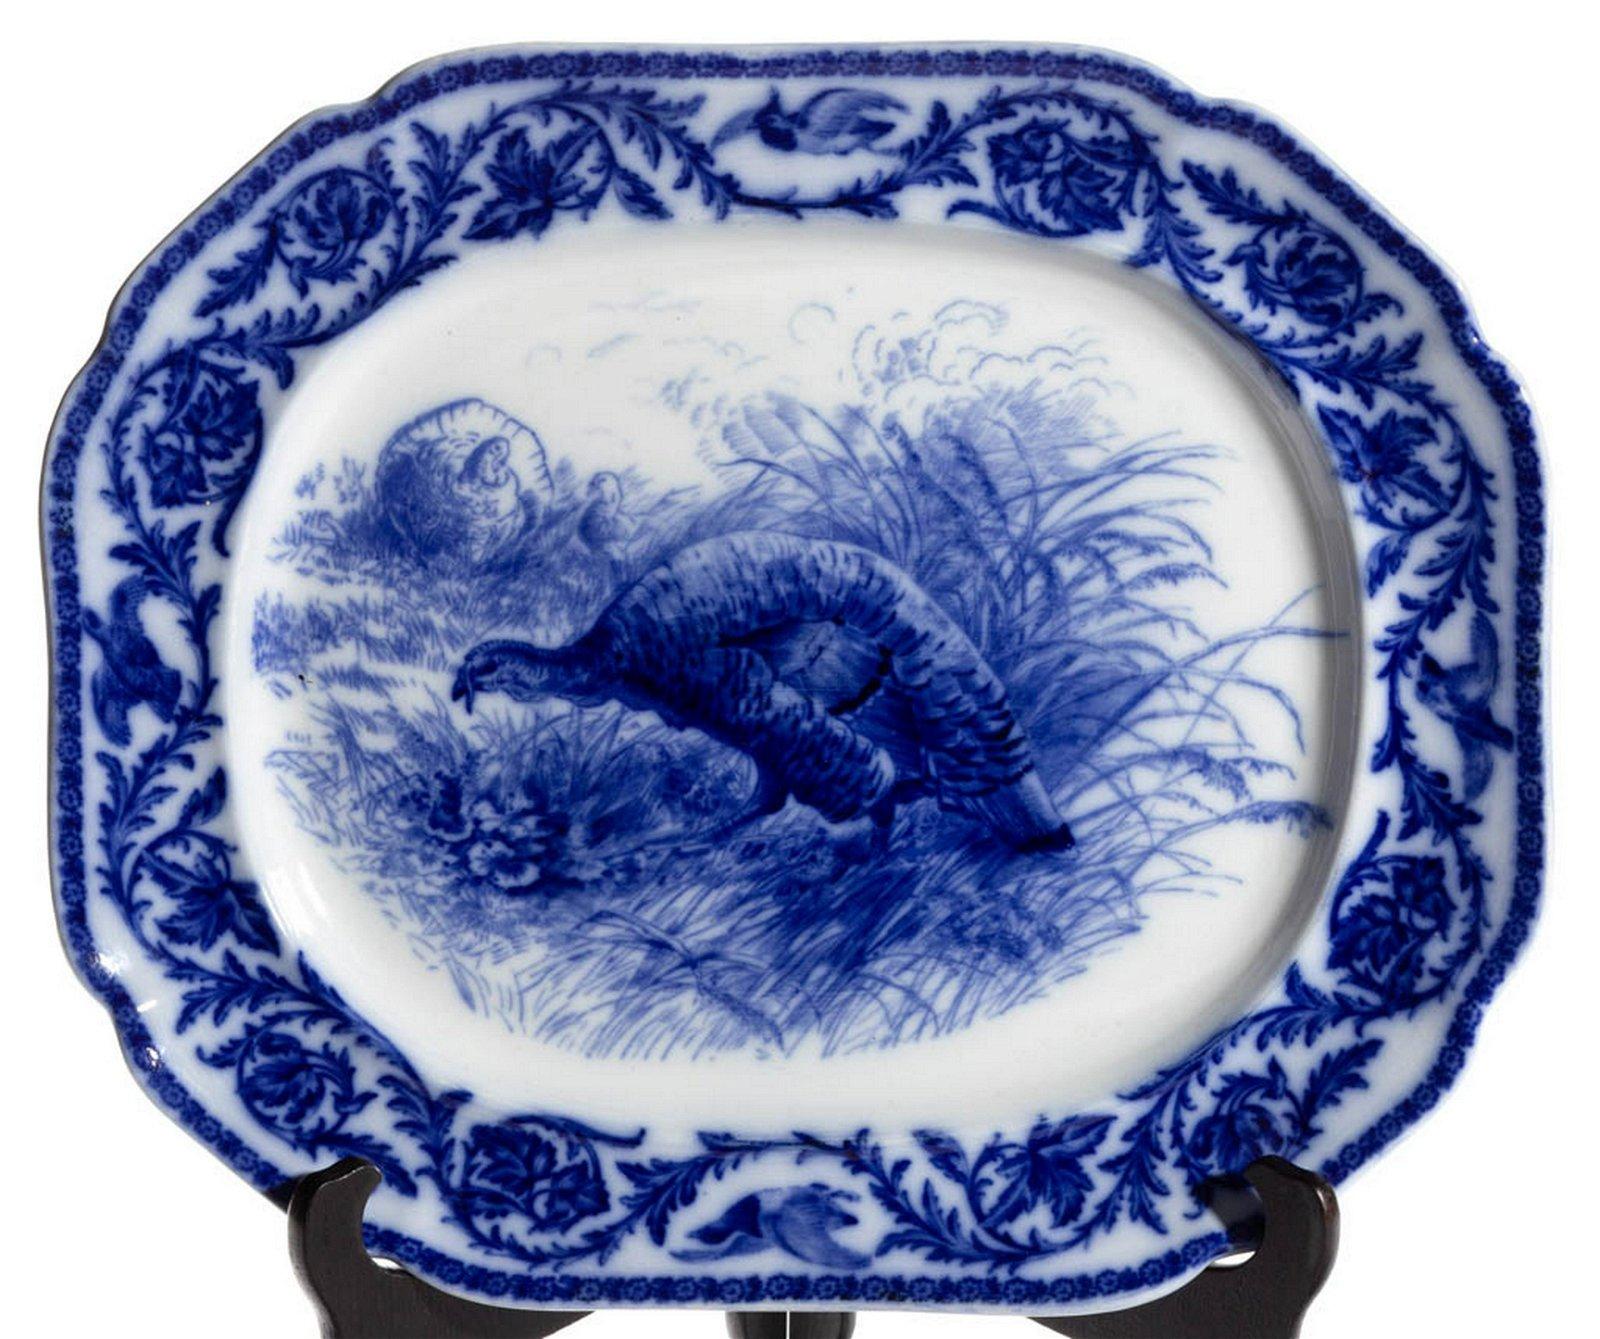 ENGLISH STAFFORDSHIRE FLOW BLUE IRONSTONE TURKEY